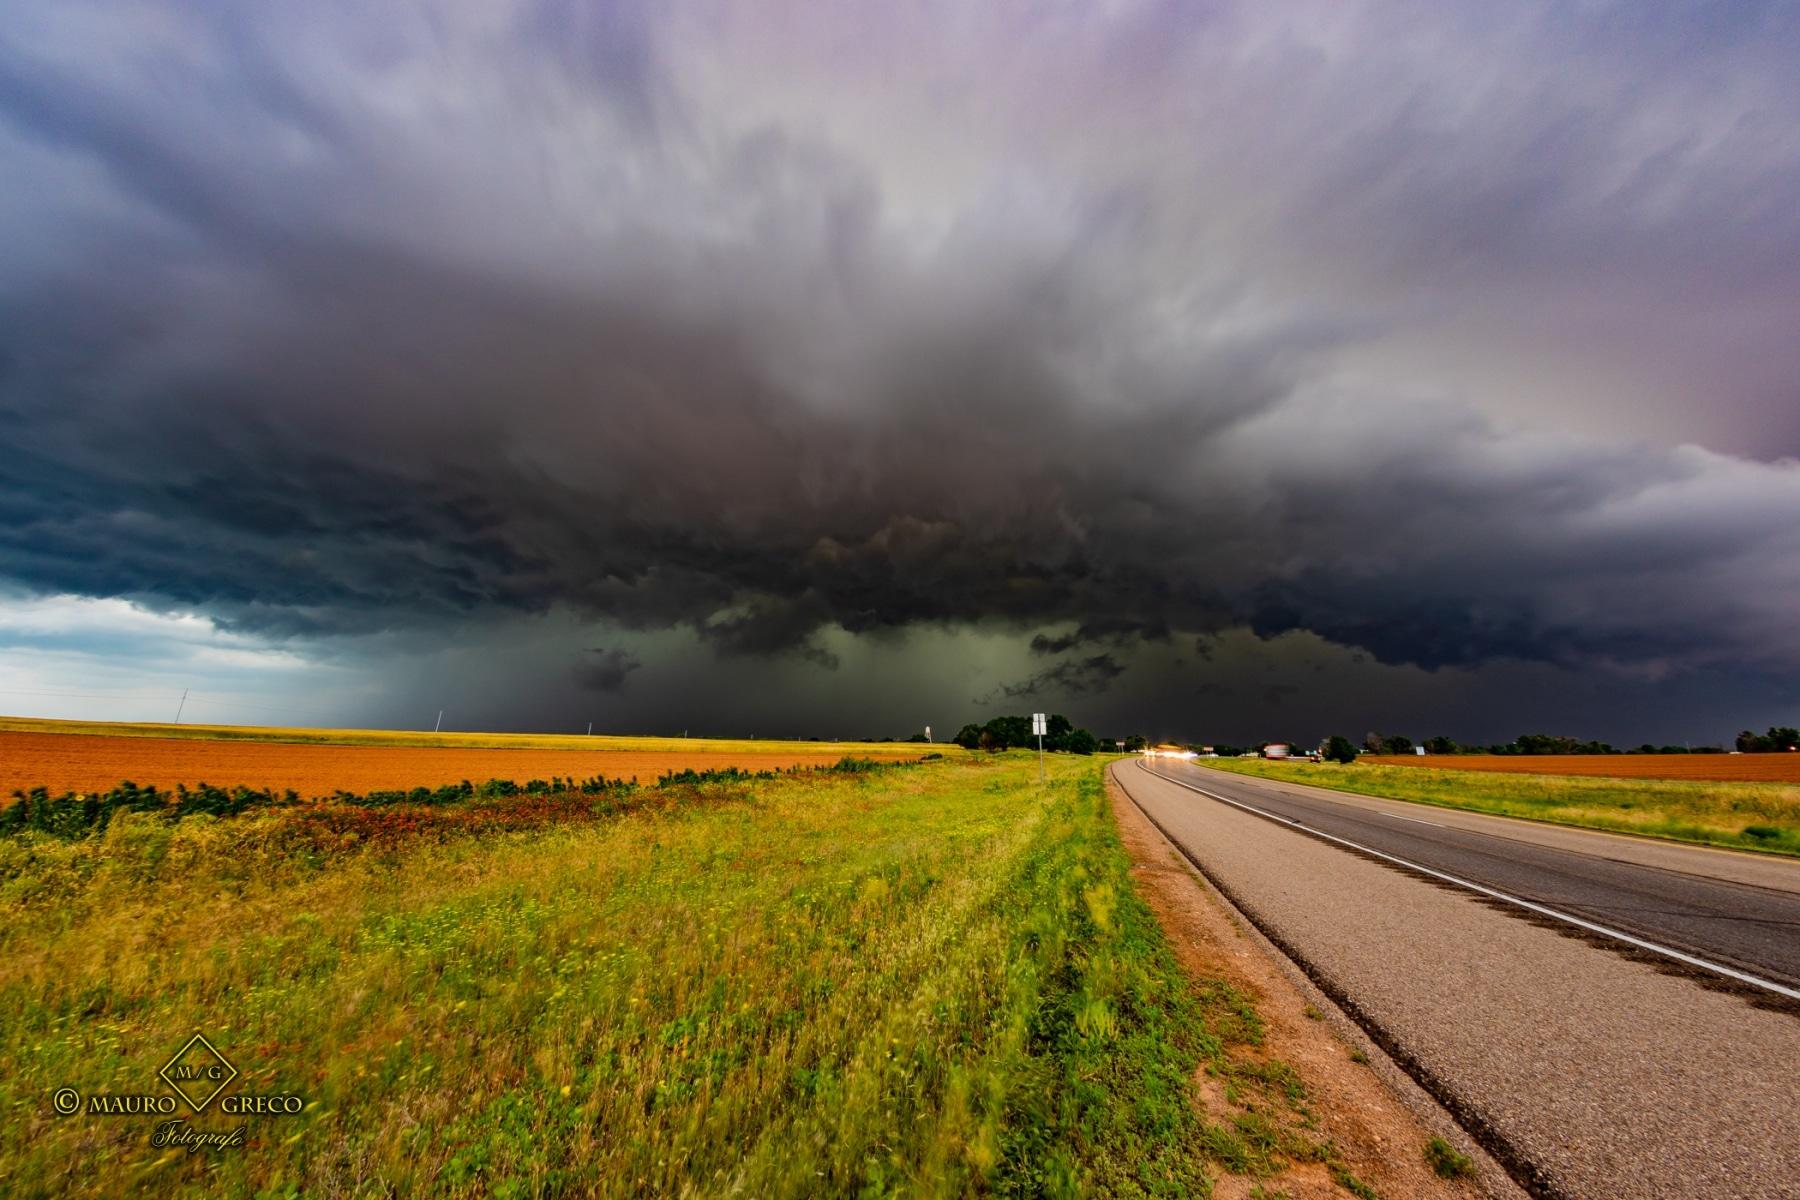 Tornado Tour StormWind 2019